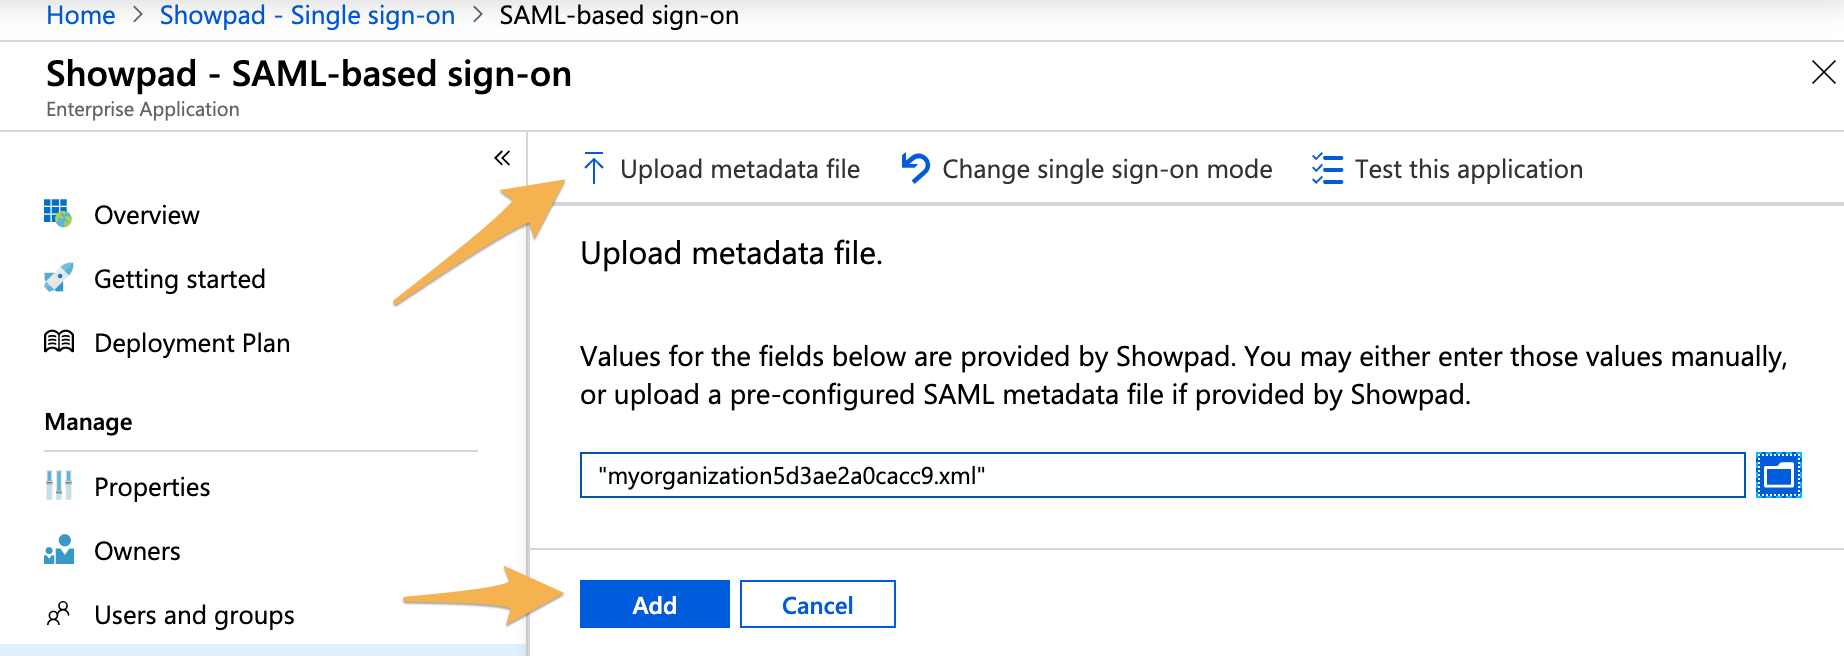 Showpad_-_Single_sign-on_-_Microsoft_Azure.png